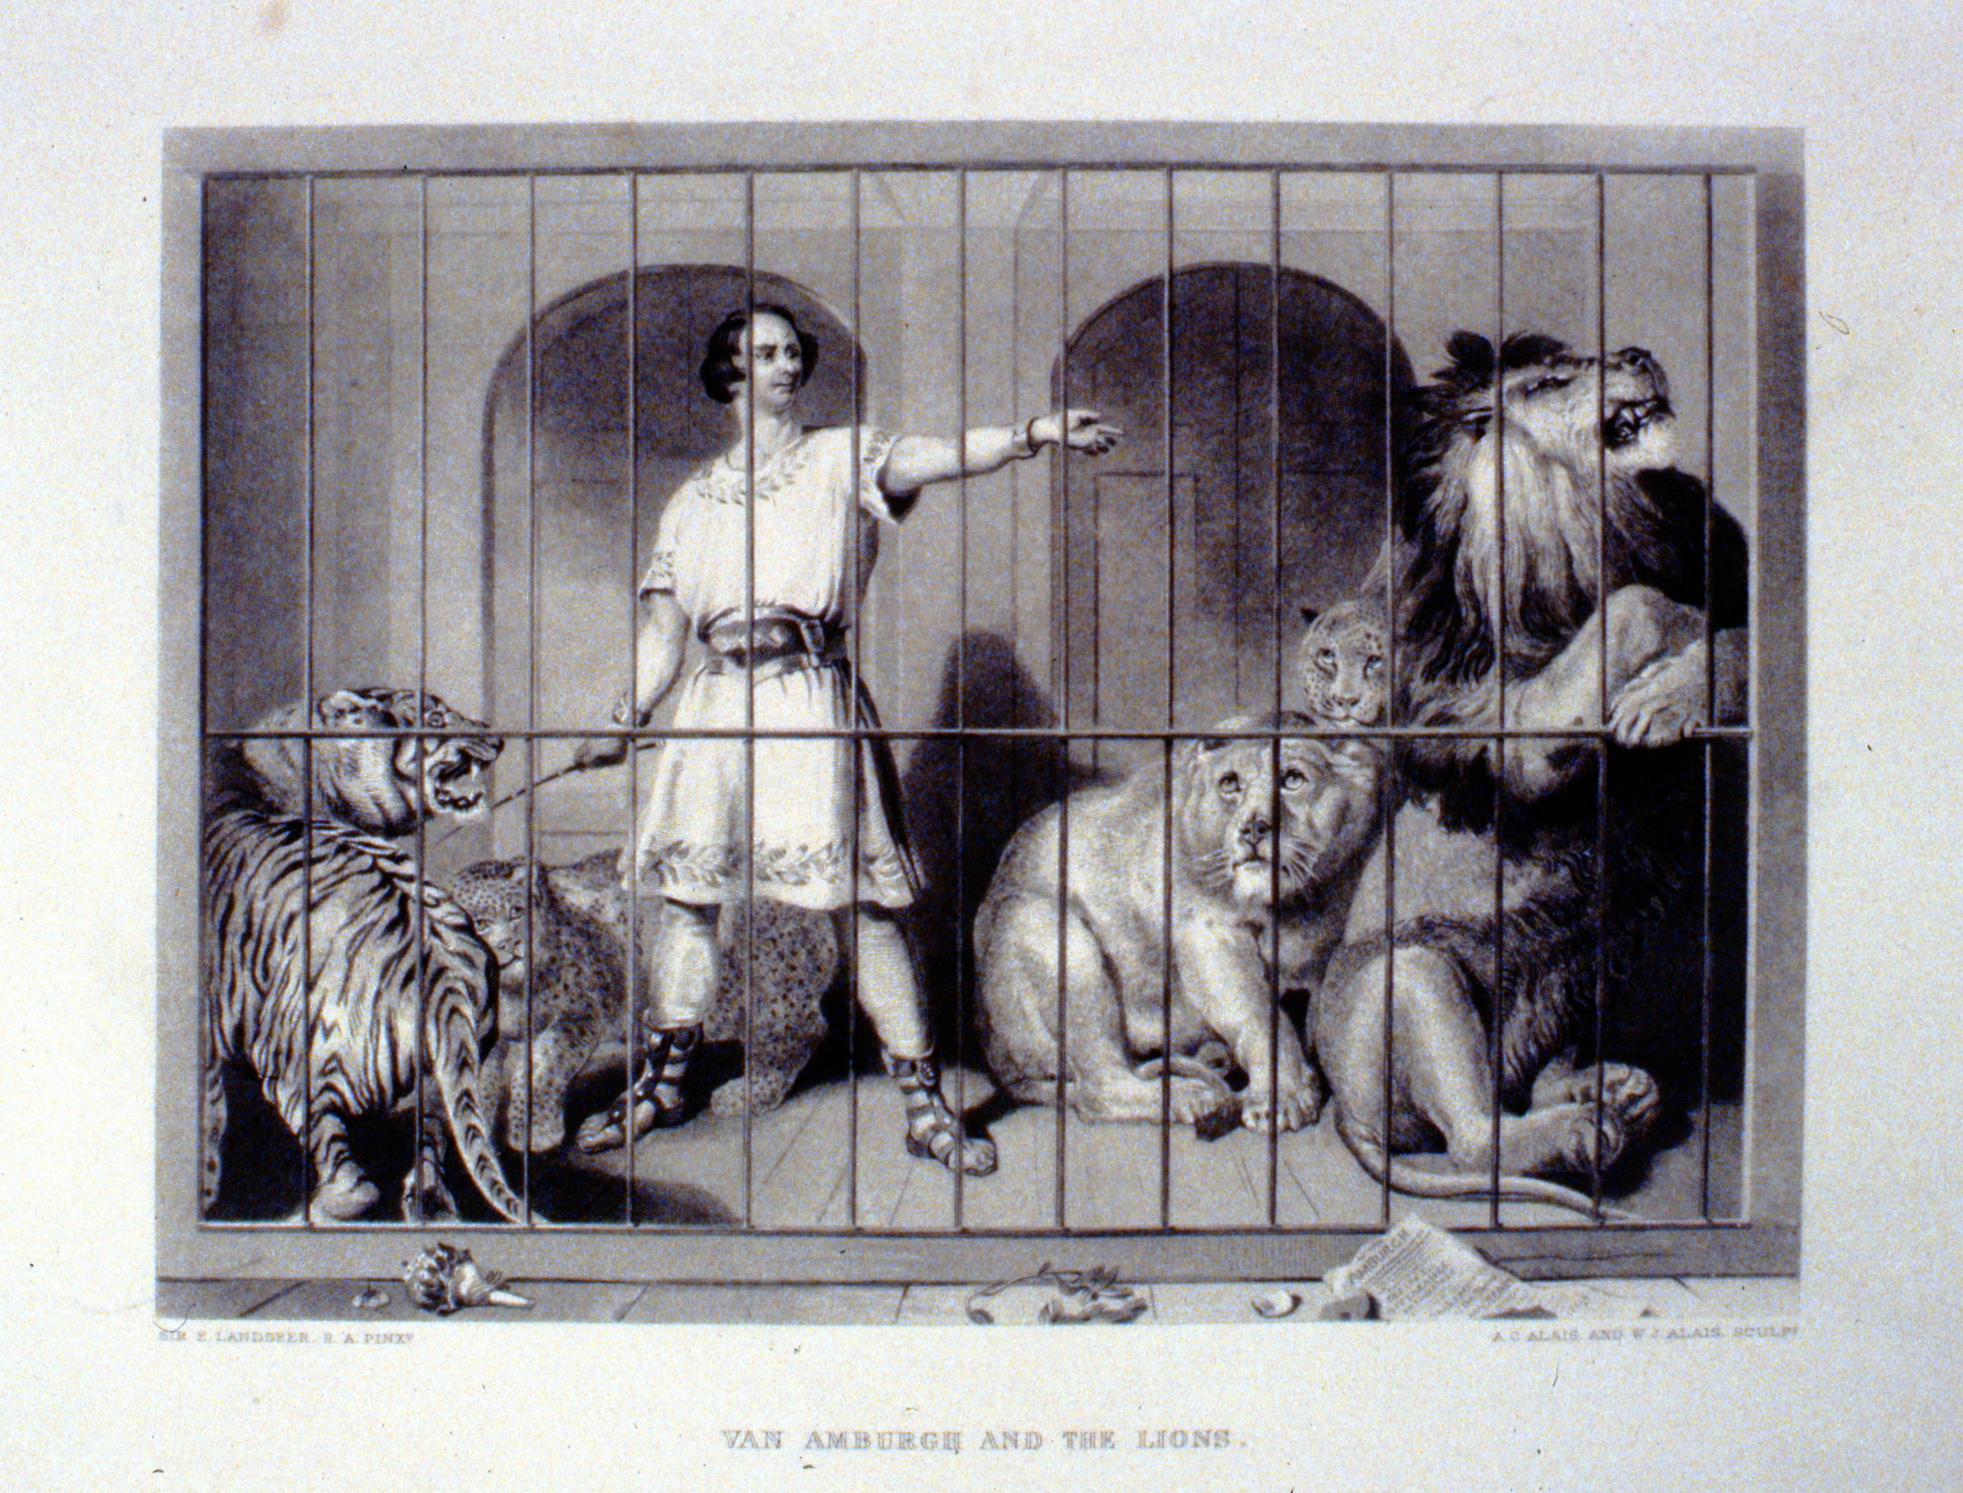 Van Amburgh and the Lions , c. late 19th Century, A.C. Alais & W.J. Alais, steel engraving, 18 cm x 25 cm, 1996.08.33, gift of Yvonne Adams